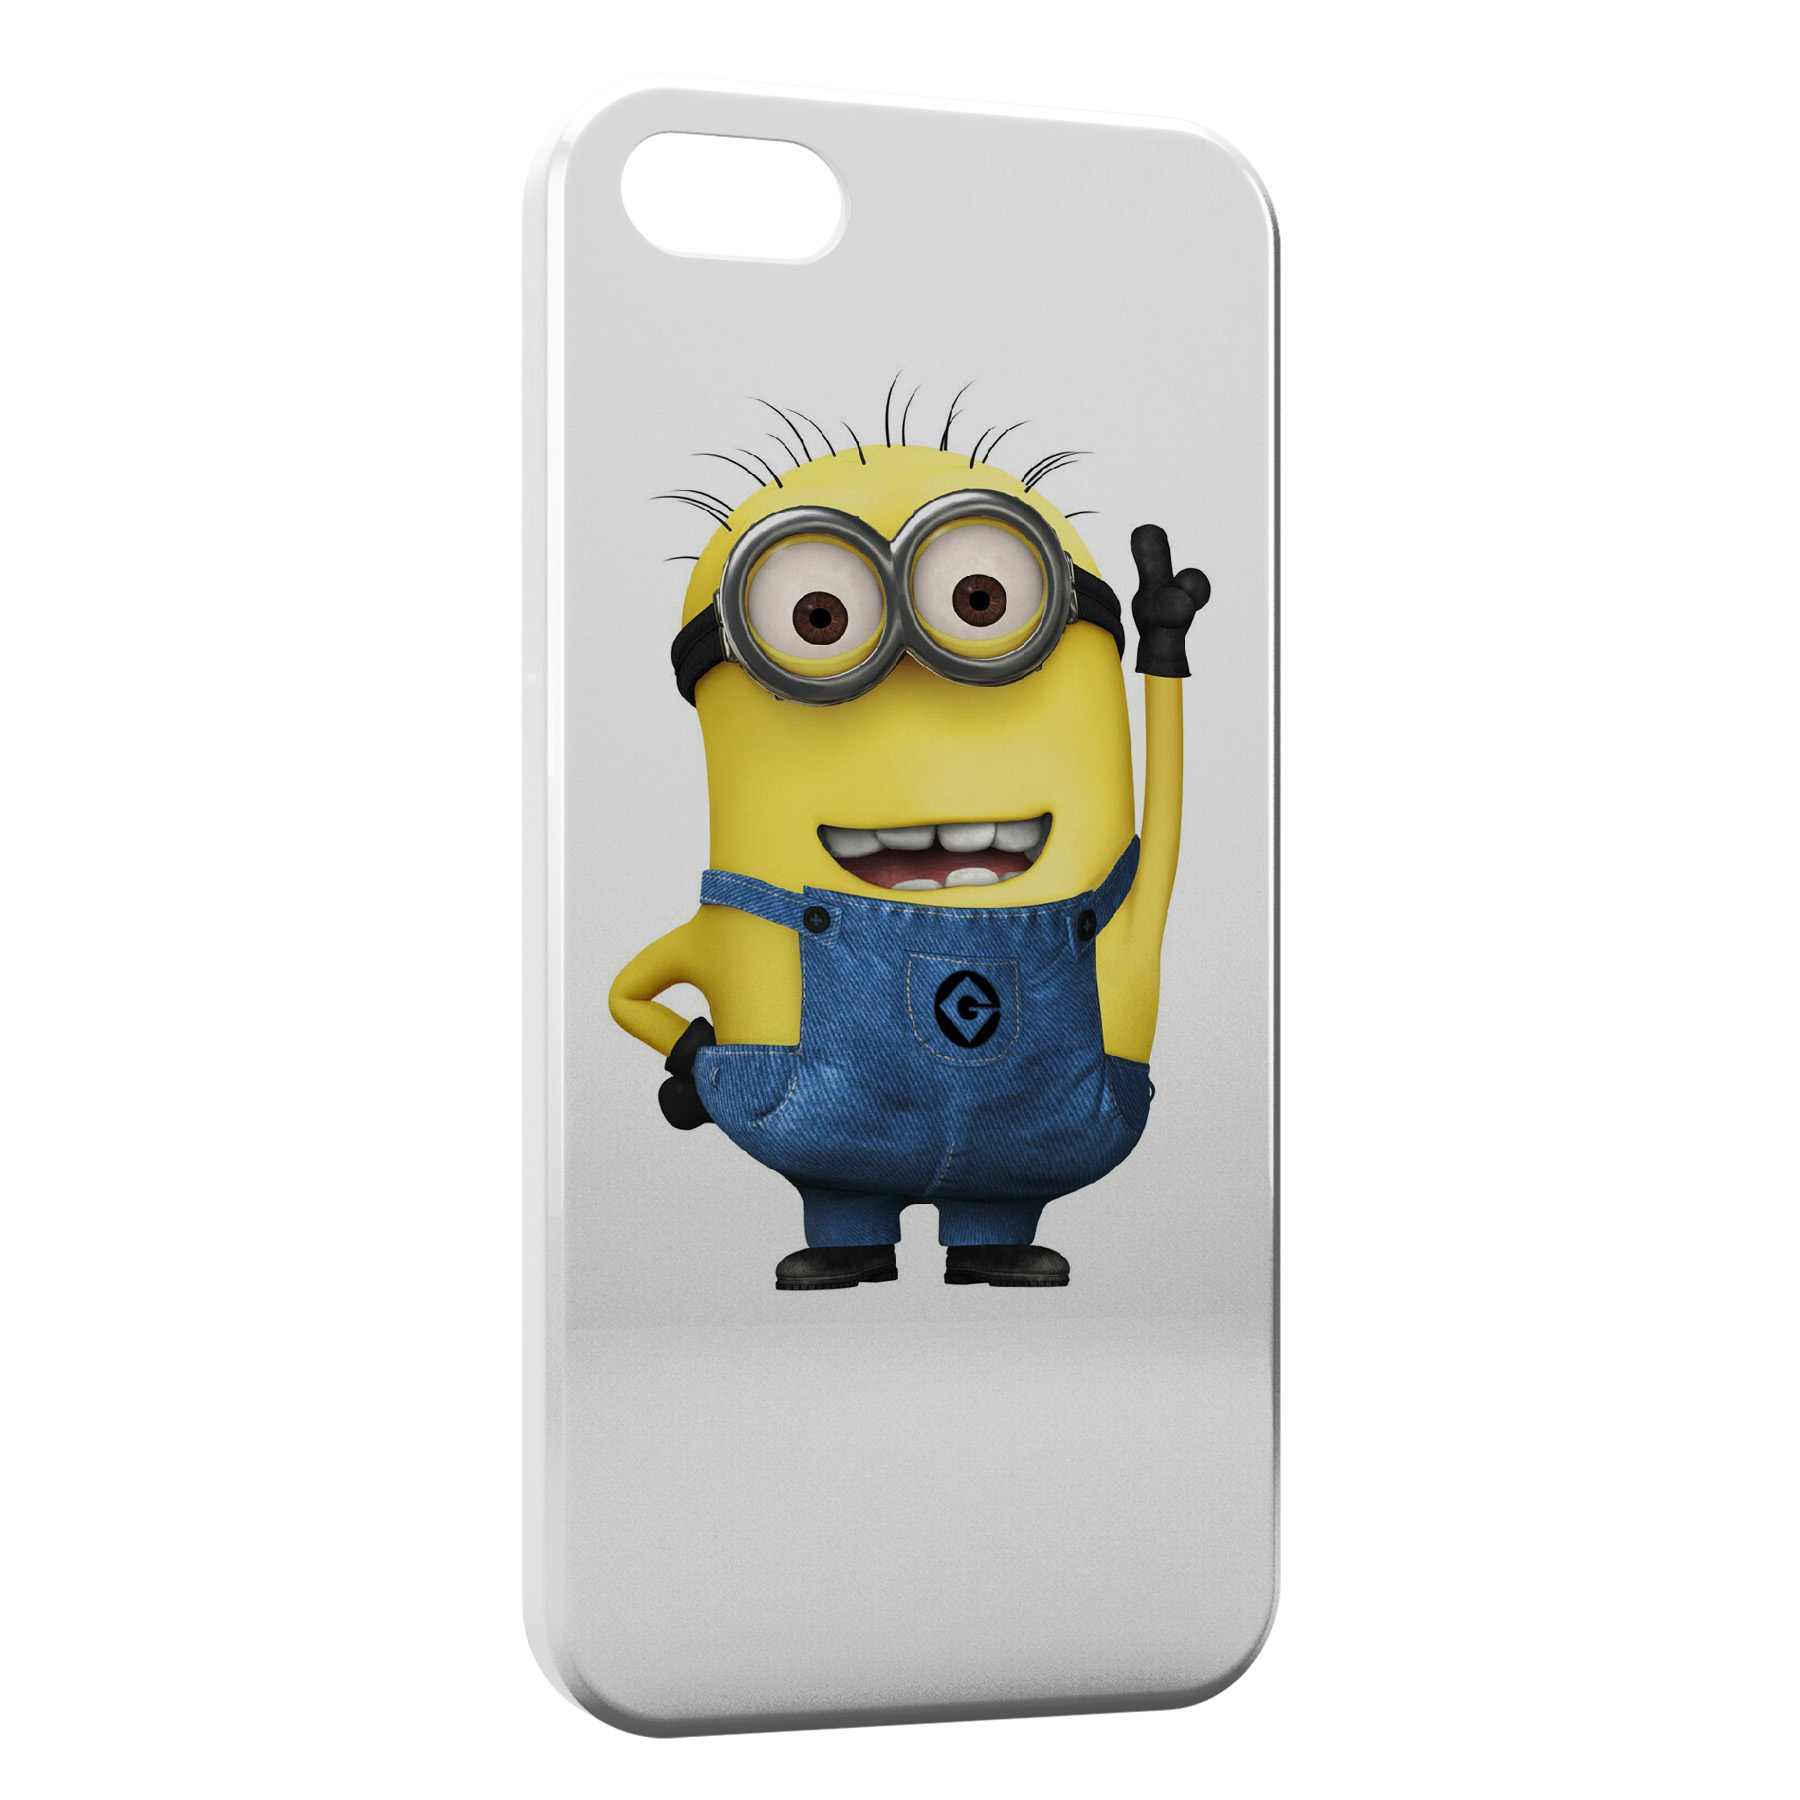 Coque iPhone 4 4S Minion 2